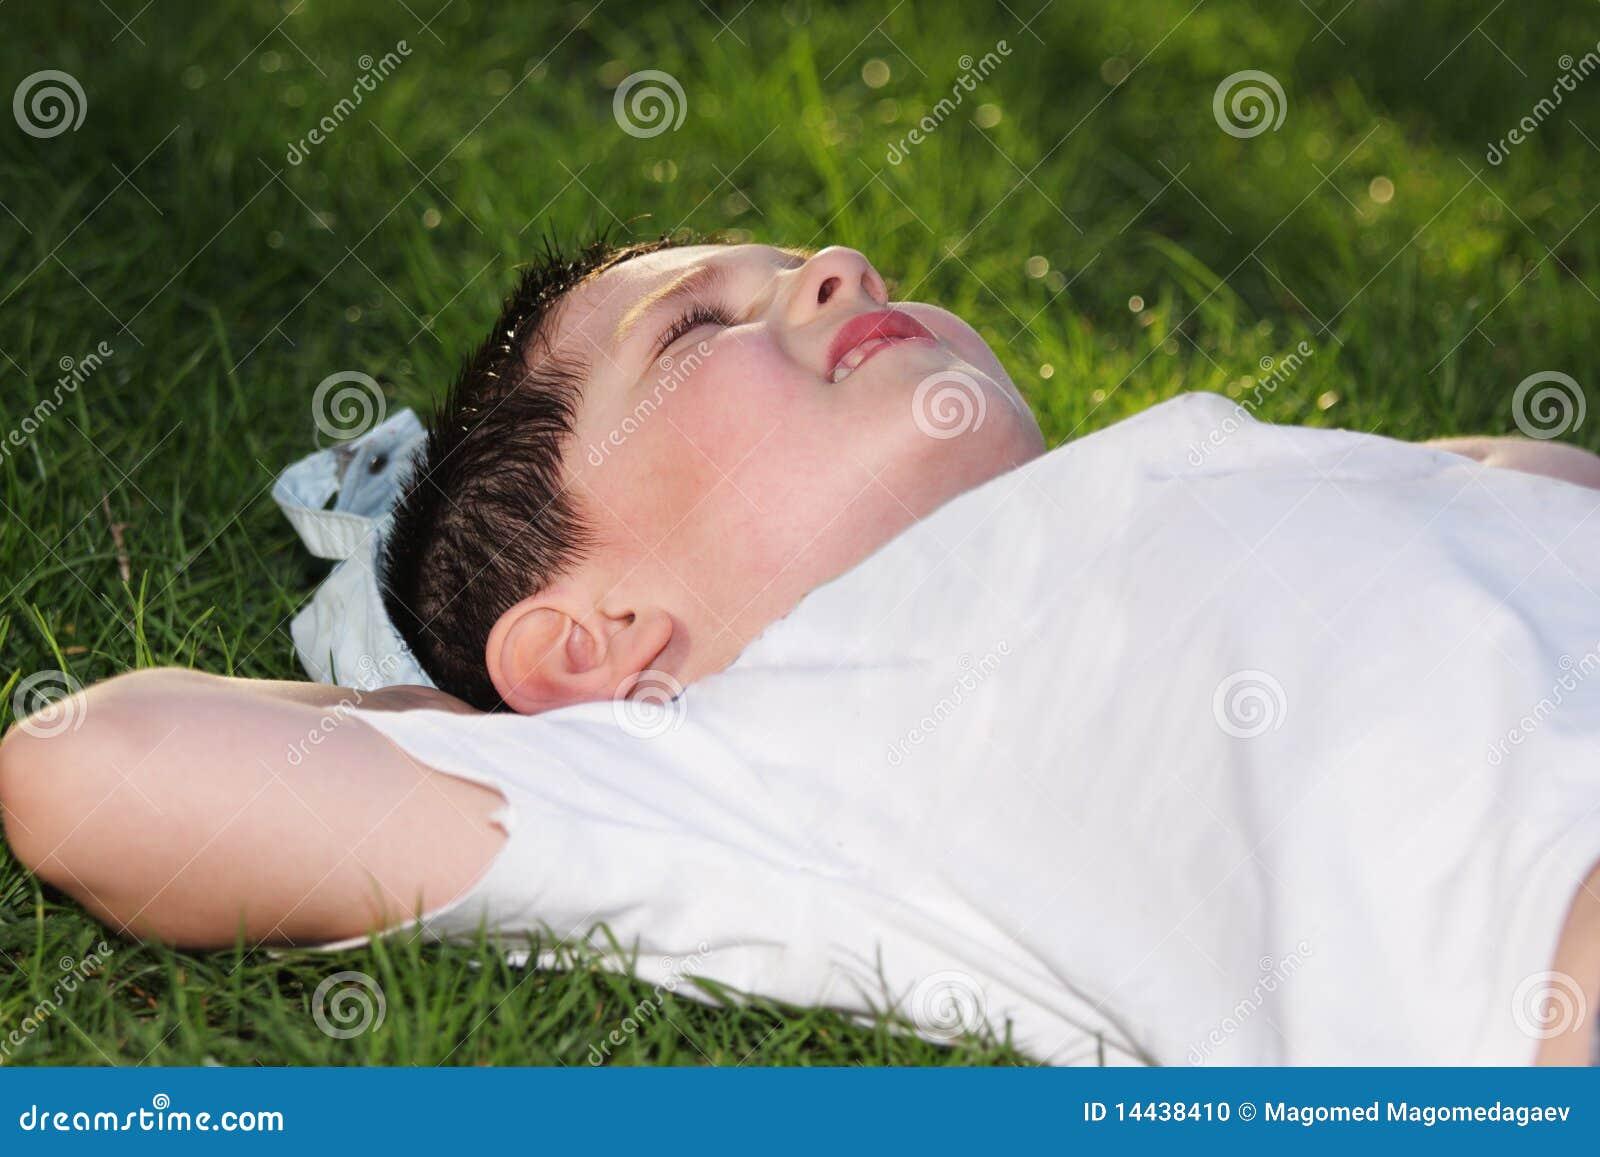 boy-laying-down